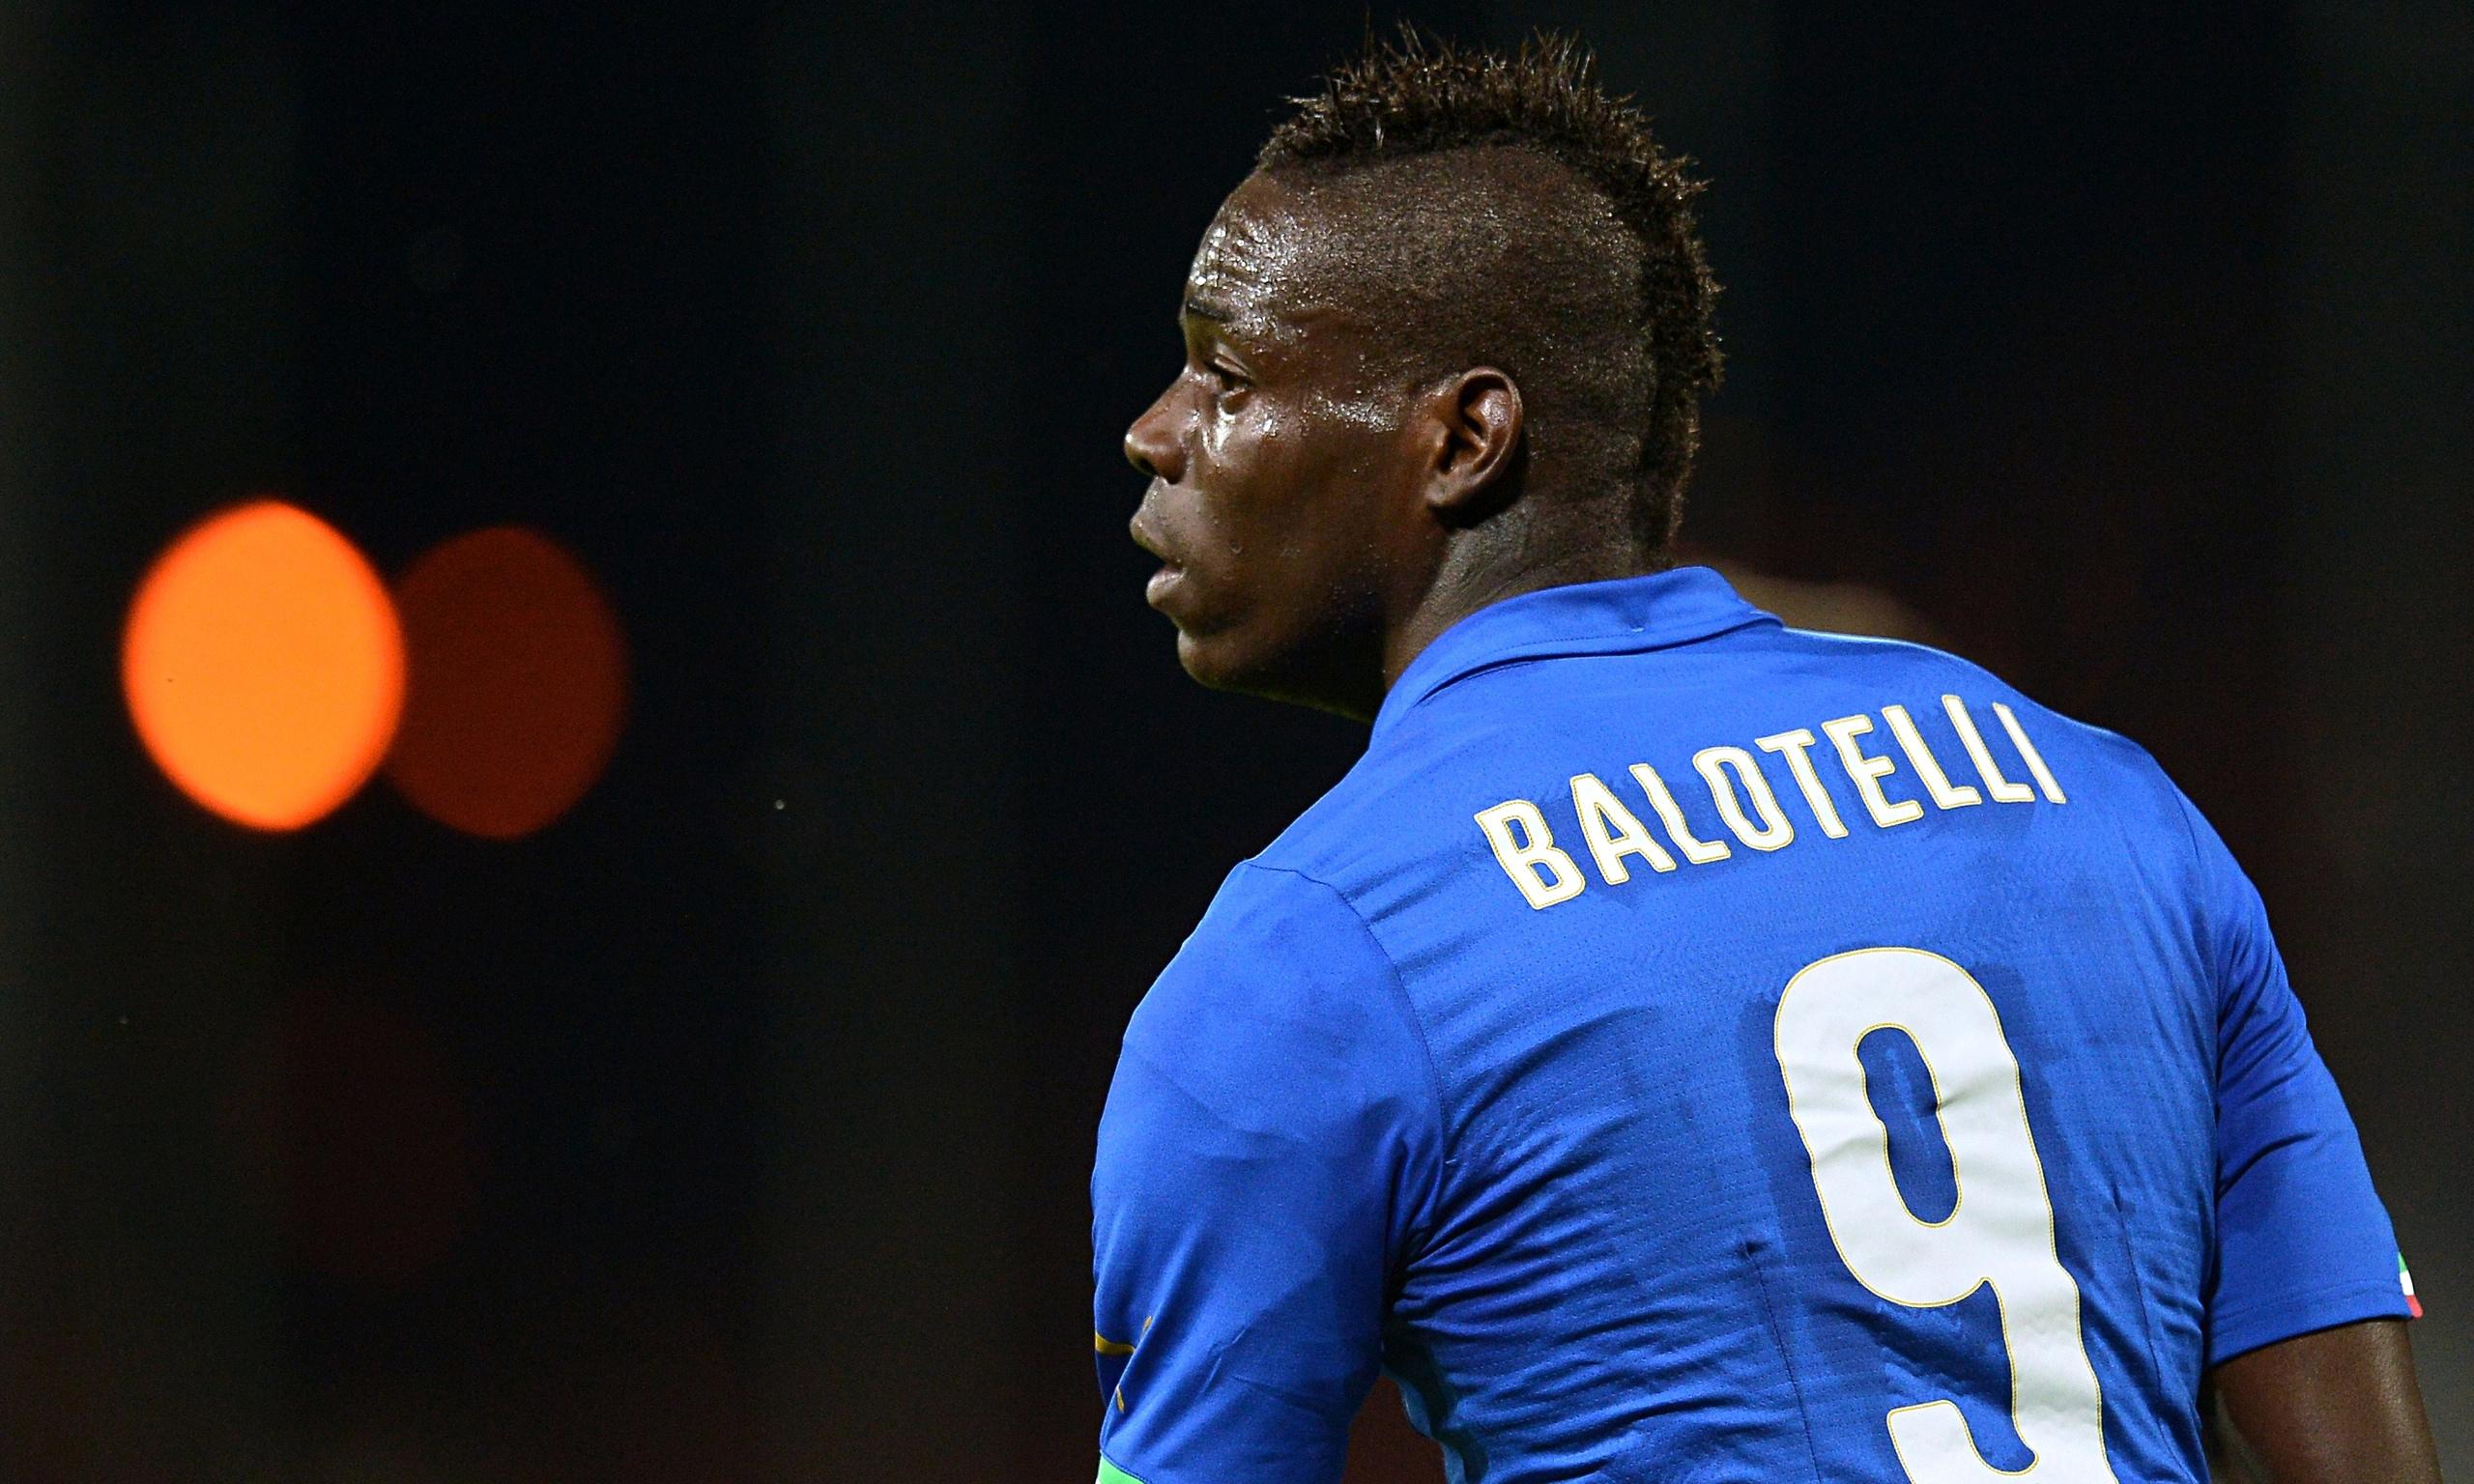 Balotelli a trouvé son nouveau club